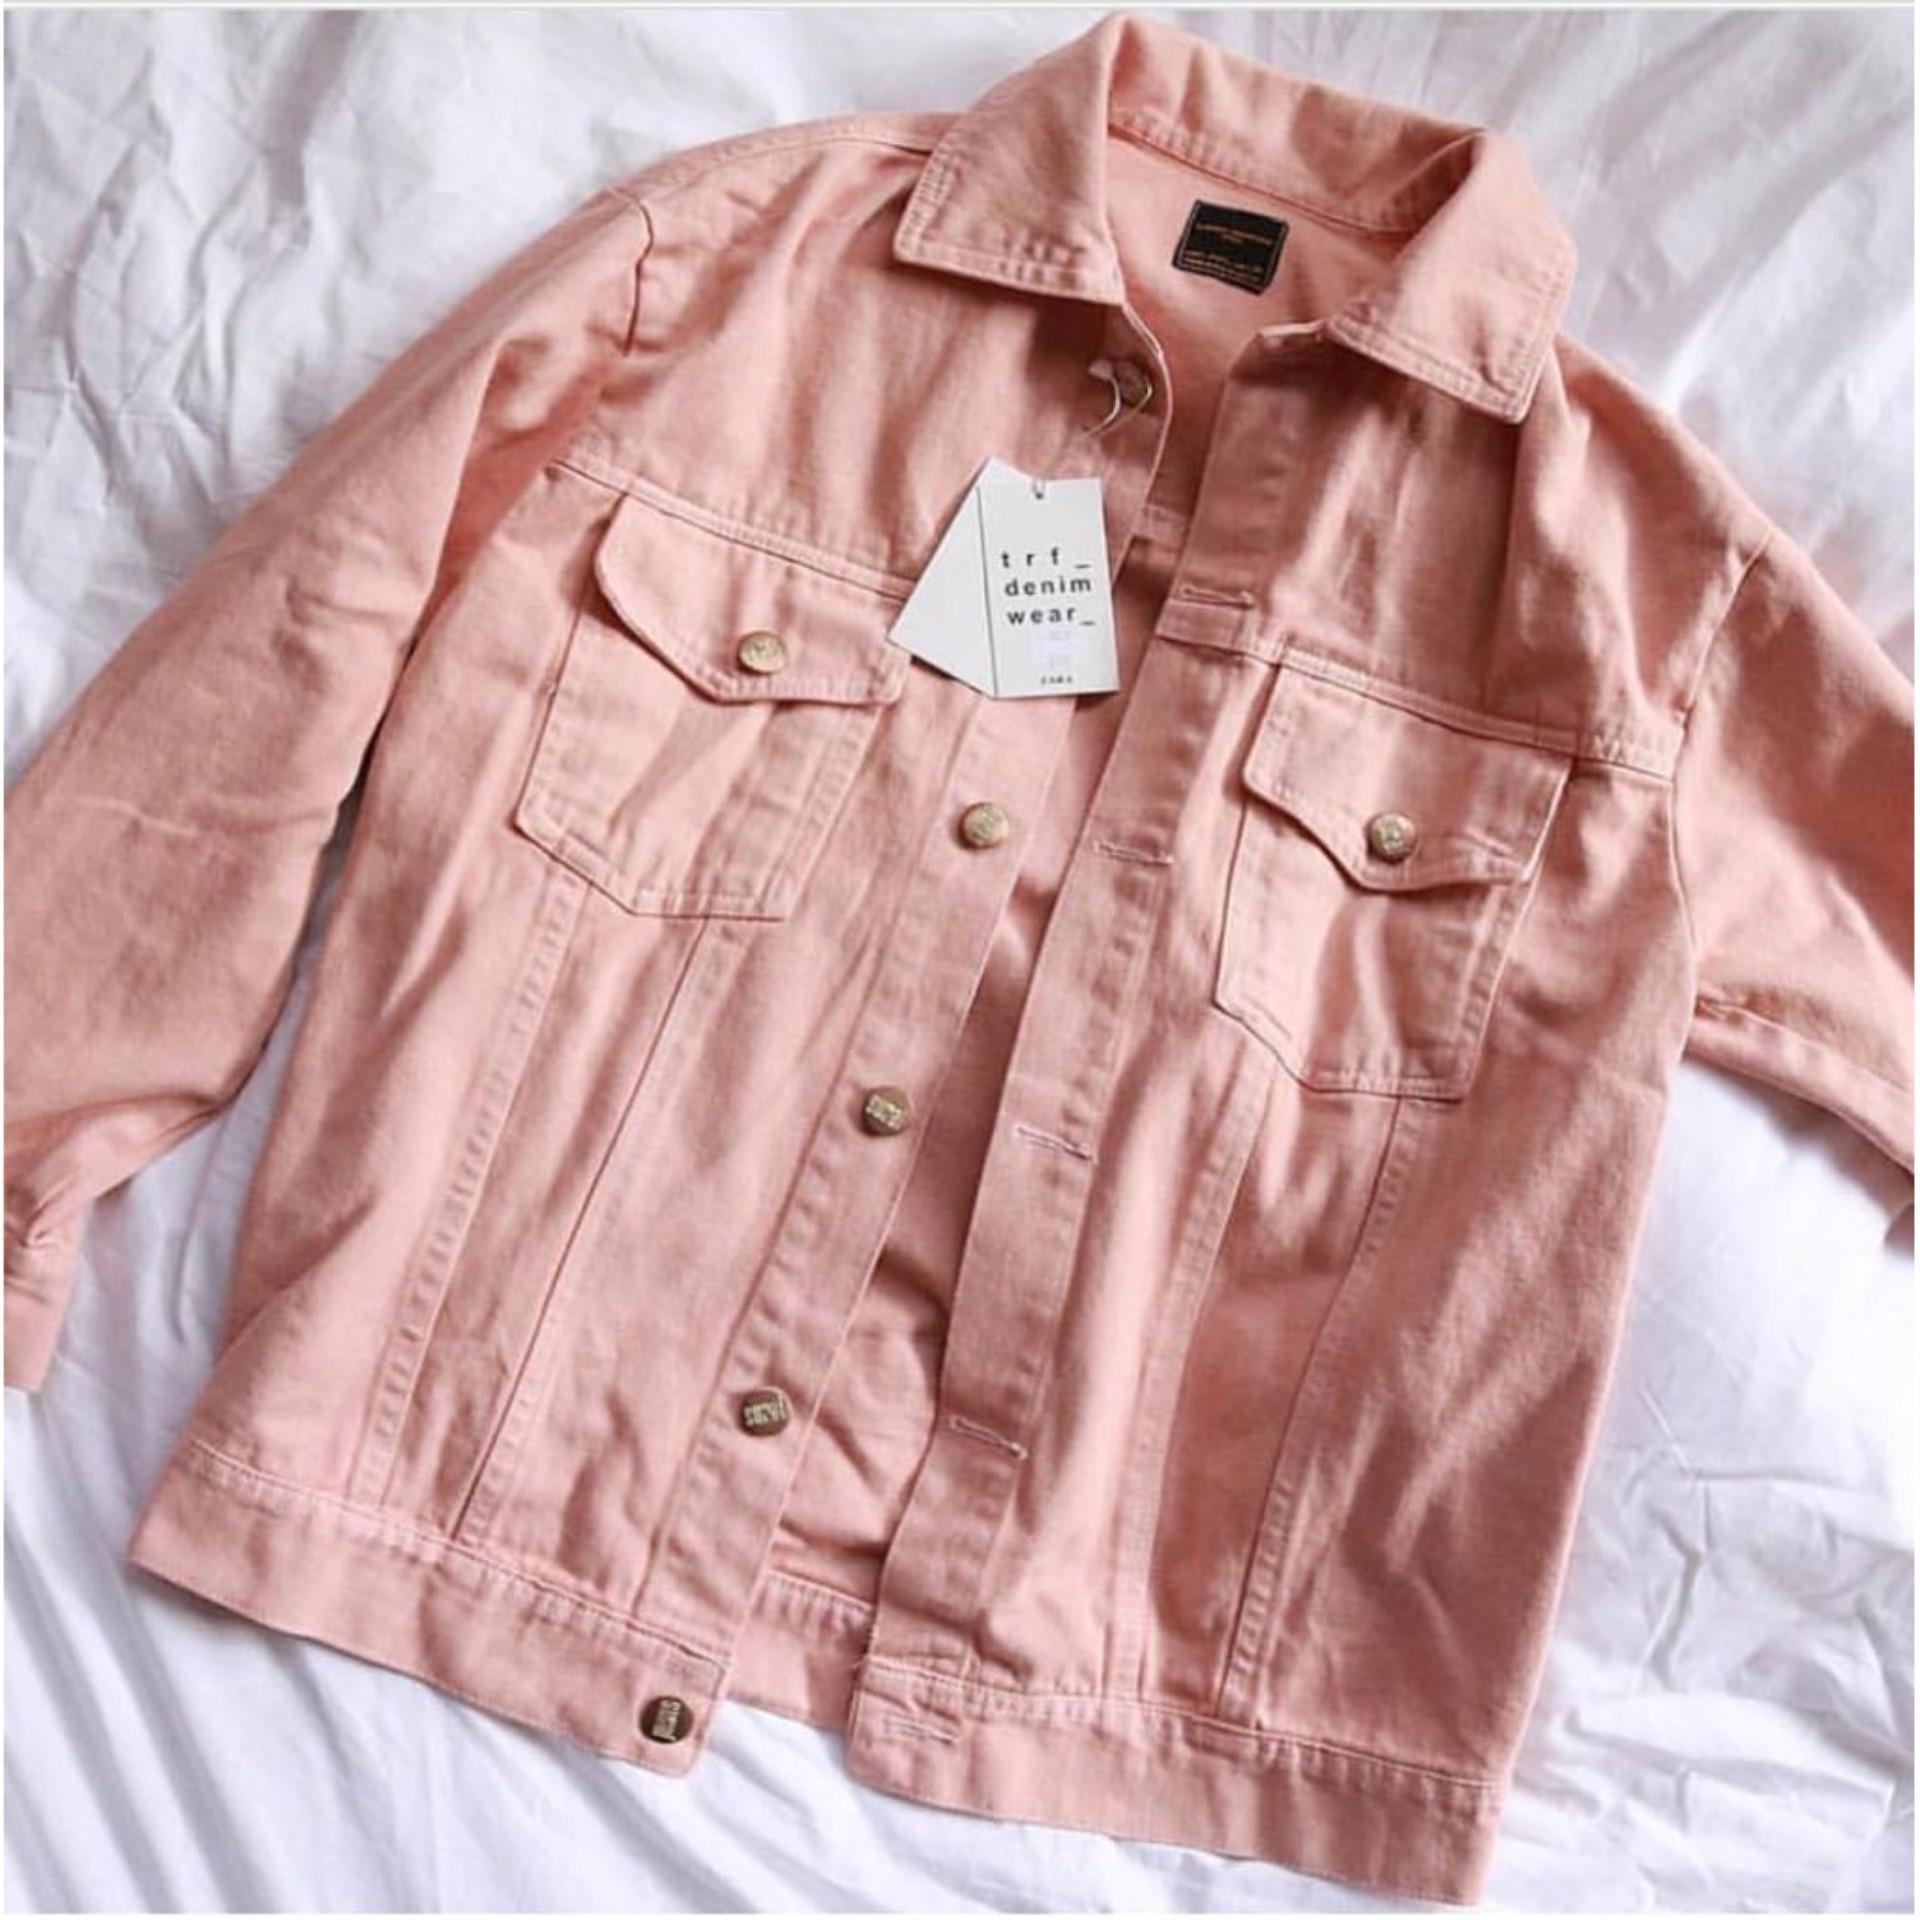 List Harga Jaket Jeans Big Size Termurah November 2018 Cari Dan Jumbo Xxl Xxxl Xxxxl Vrichel Blazer Wanita Premium Keila Pink